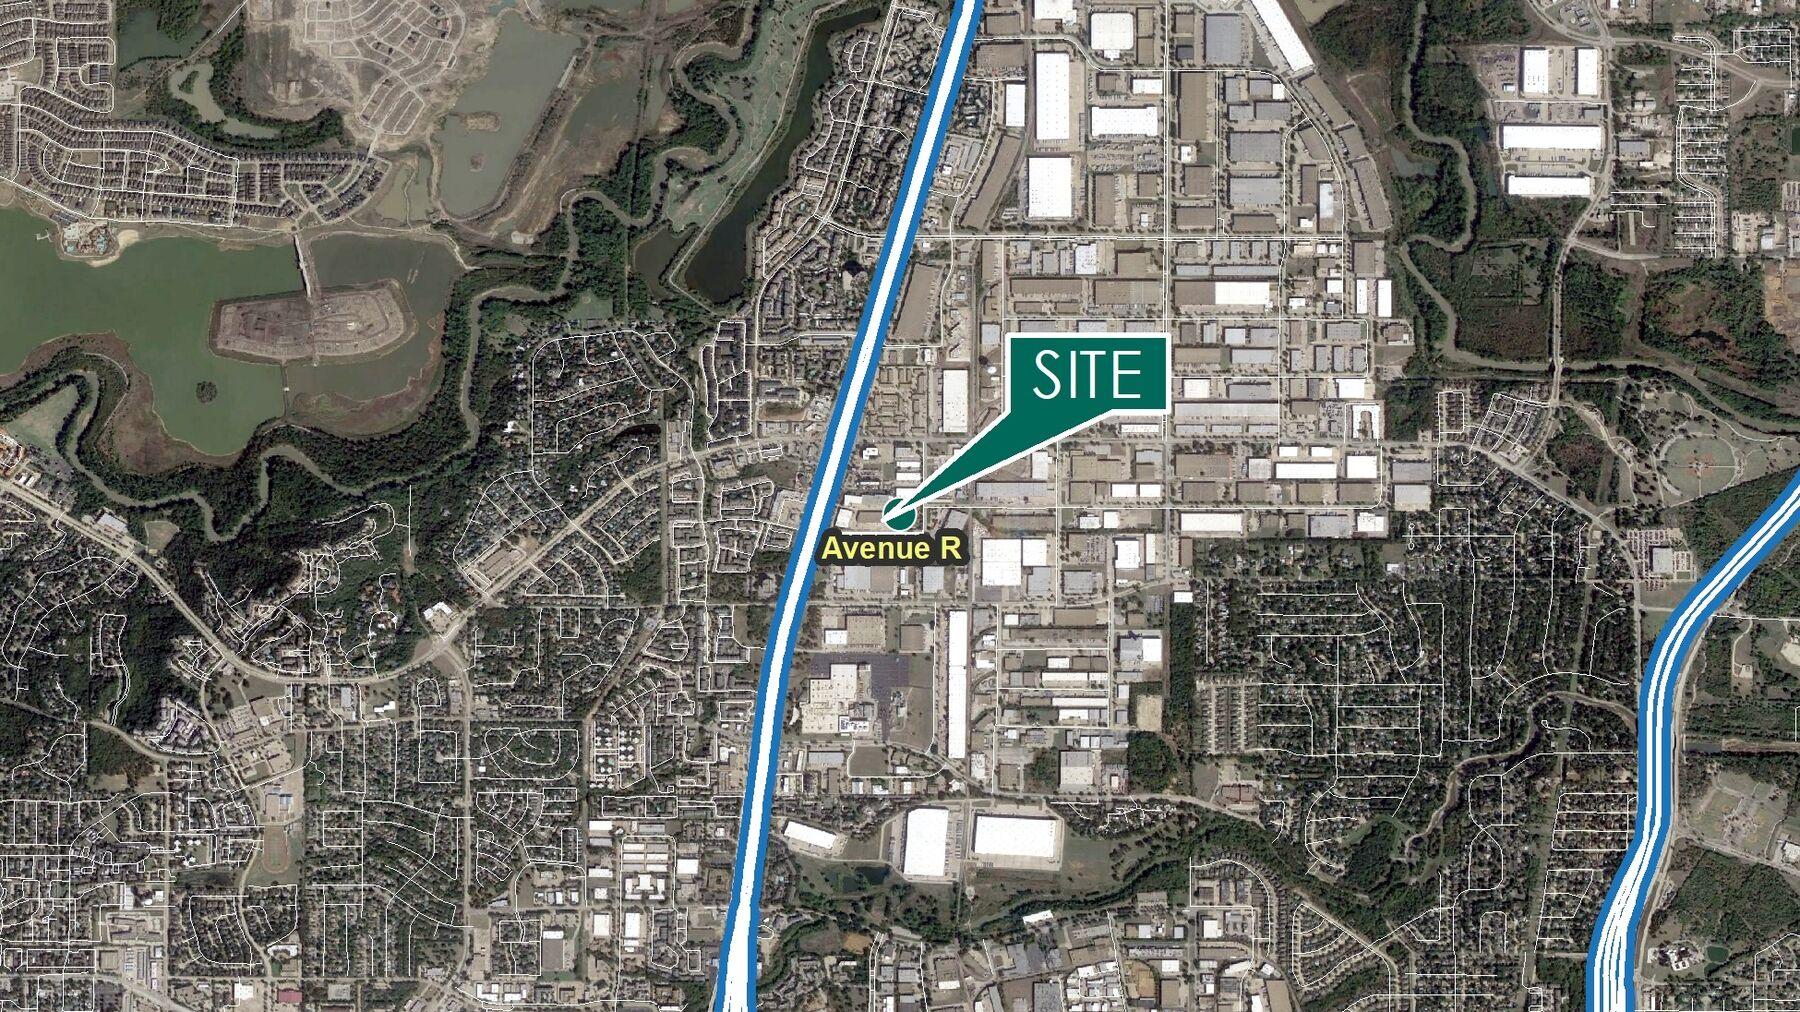 DPM-Prologis-Great-Southwest-70-DAL01770-601-609-Avenue-R_AerialMap.jpg